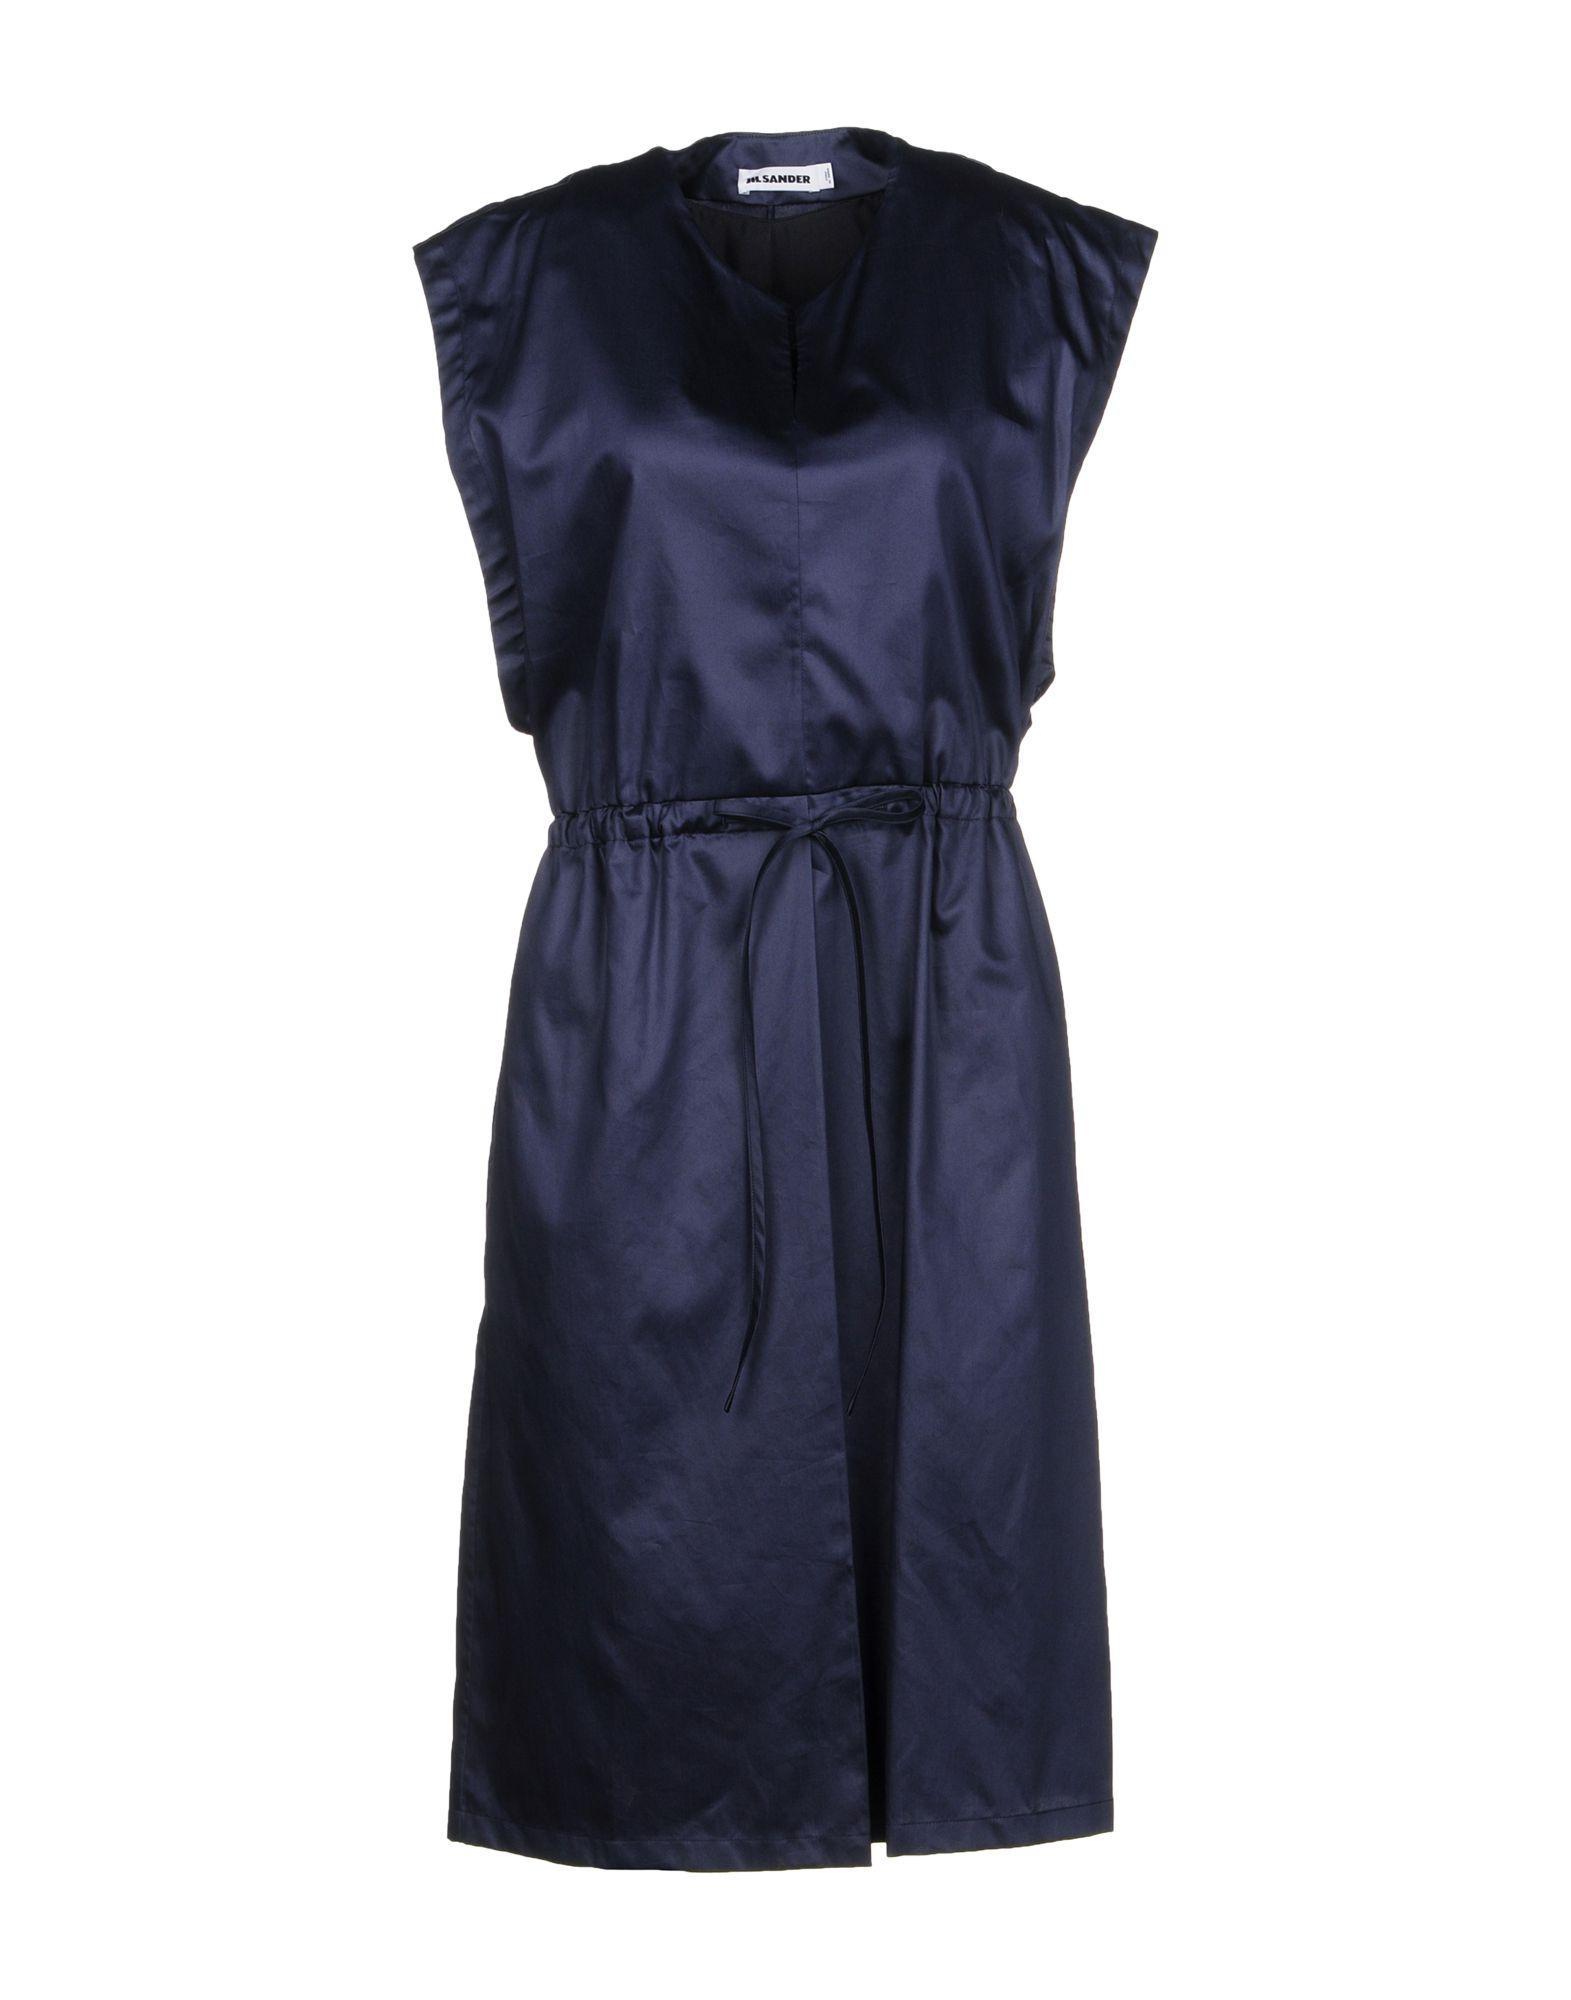 Jil Sander Knee-length Dress In Dark Blue